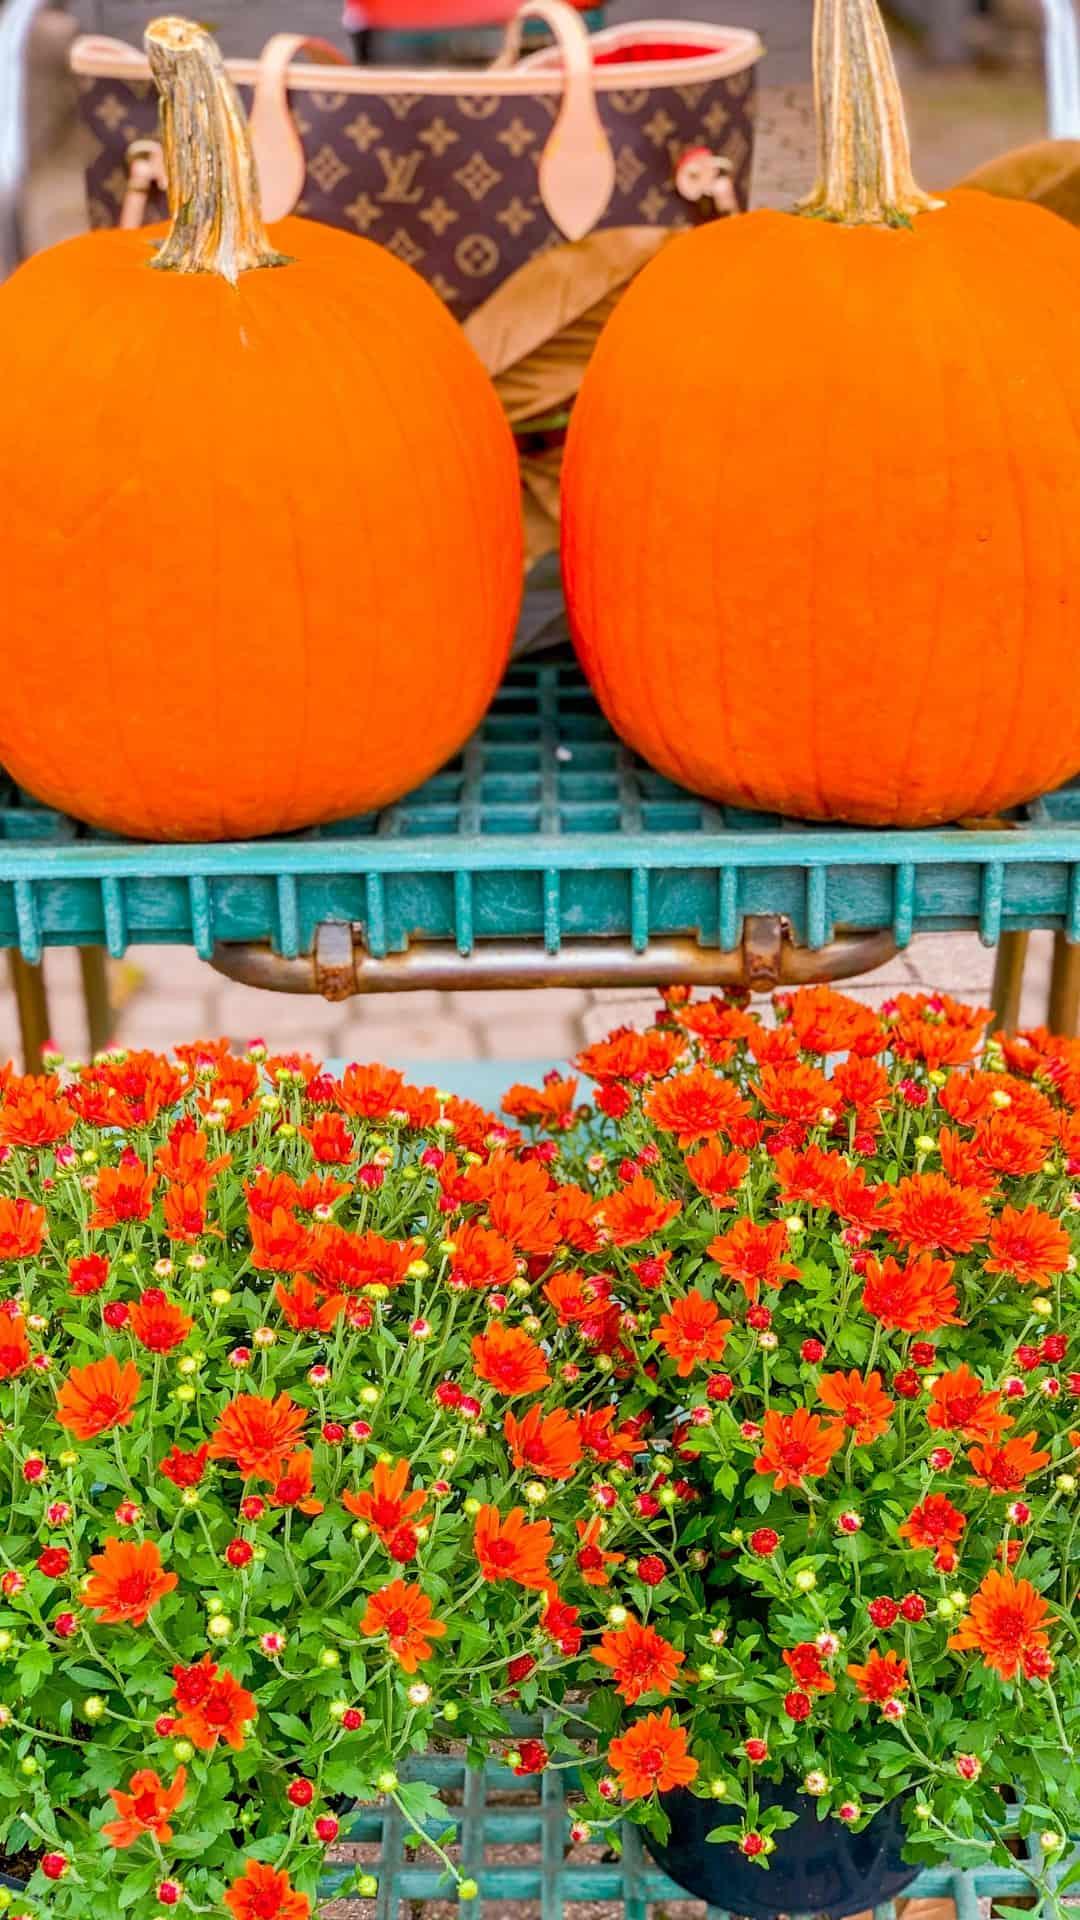 Autumn Wallpaper iPhone Aesthetic Mums